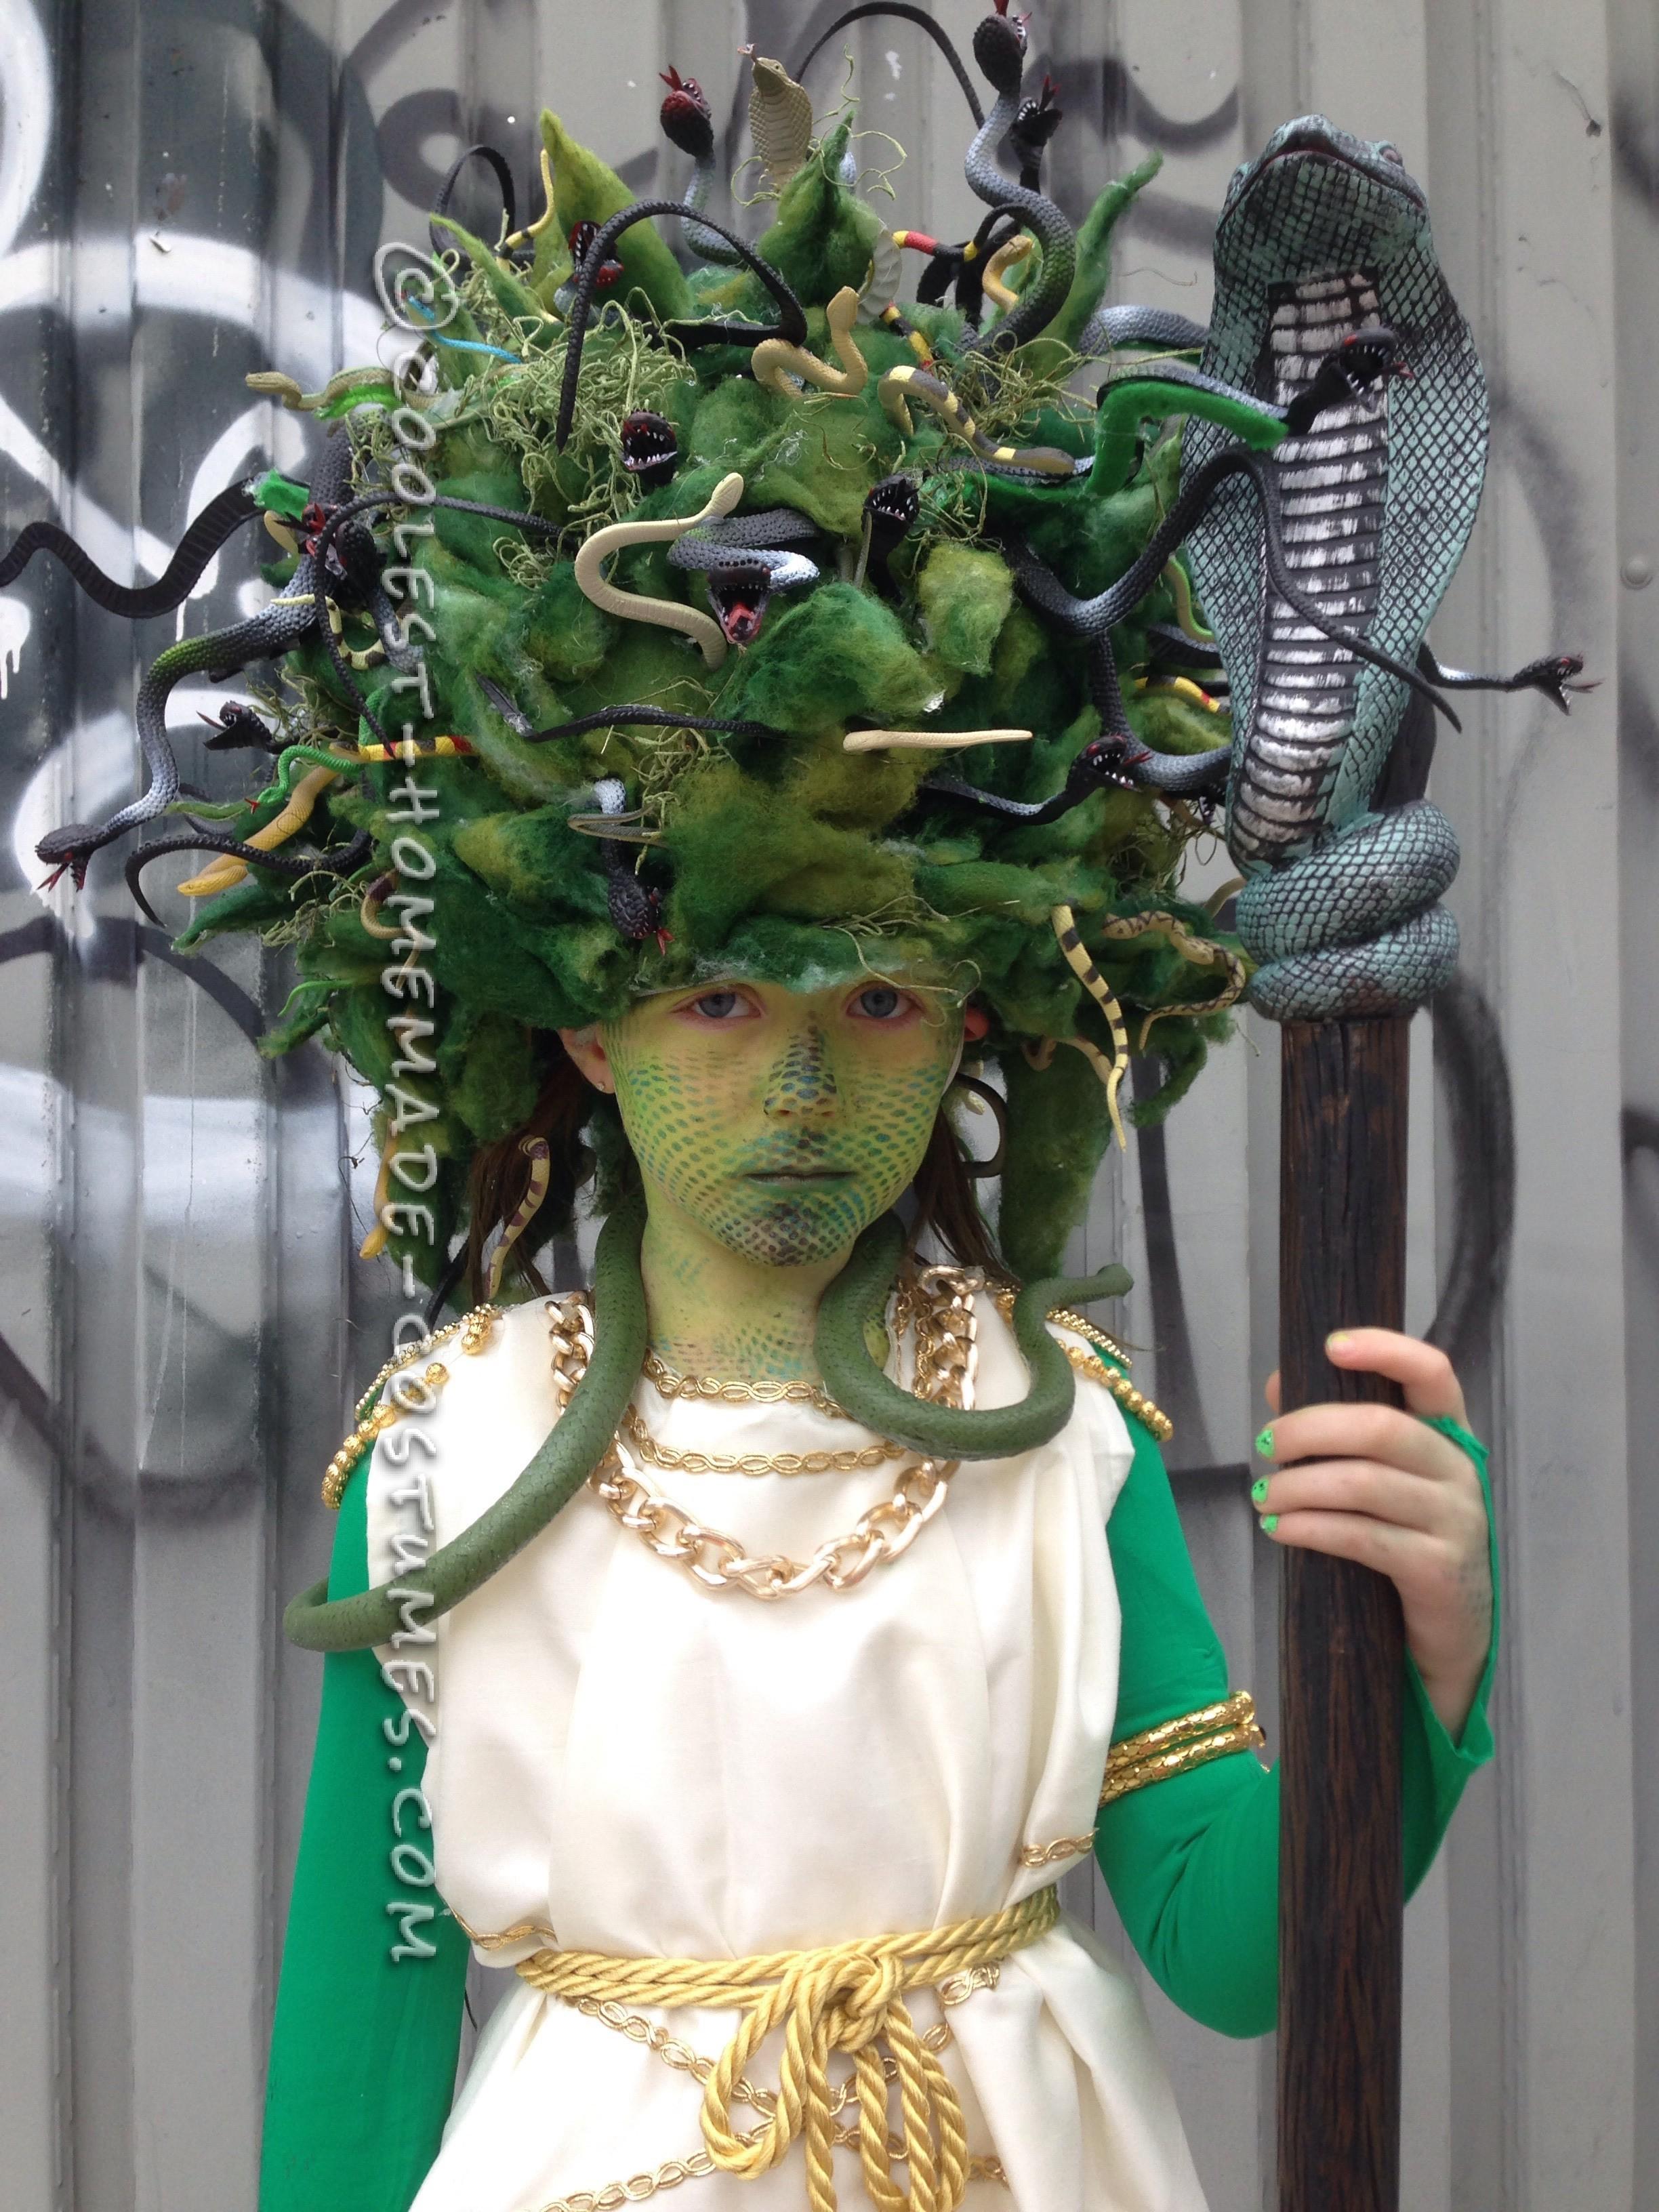 Amazing Medusa Costume and Makeup